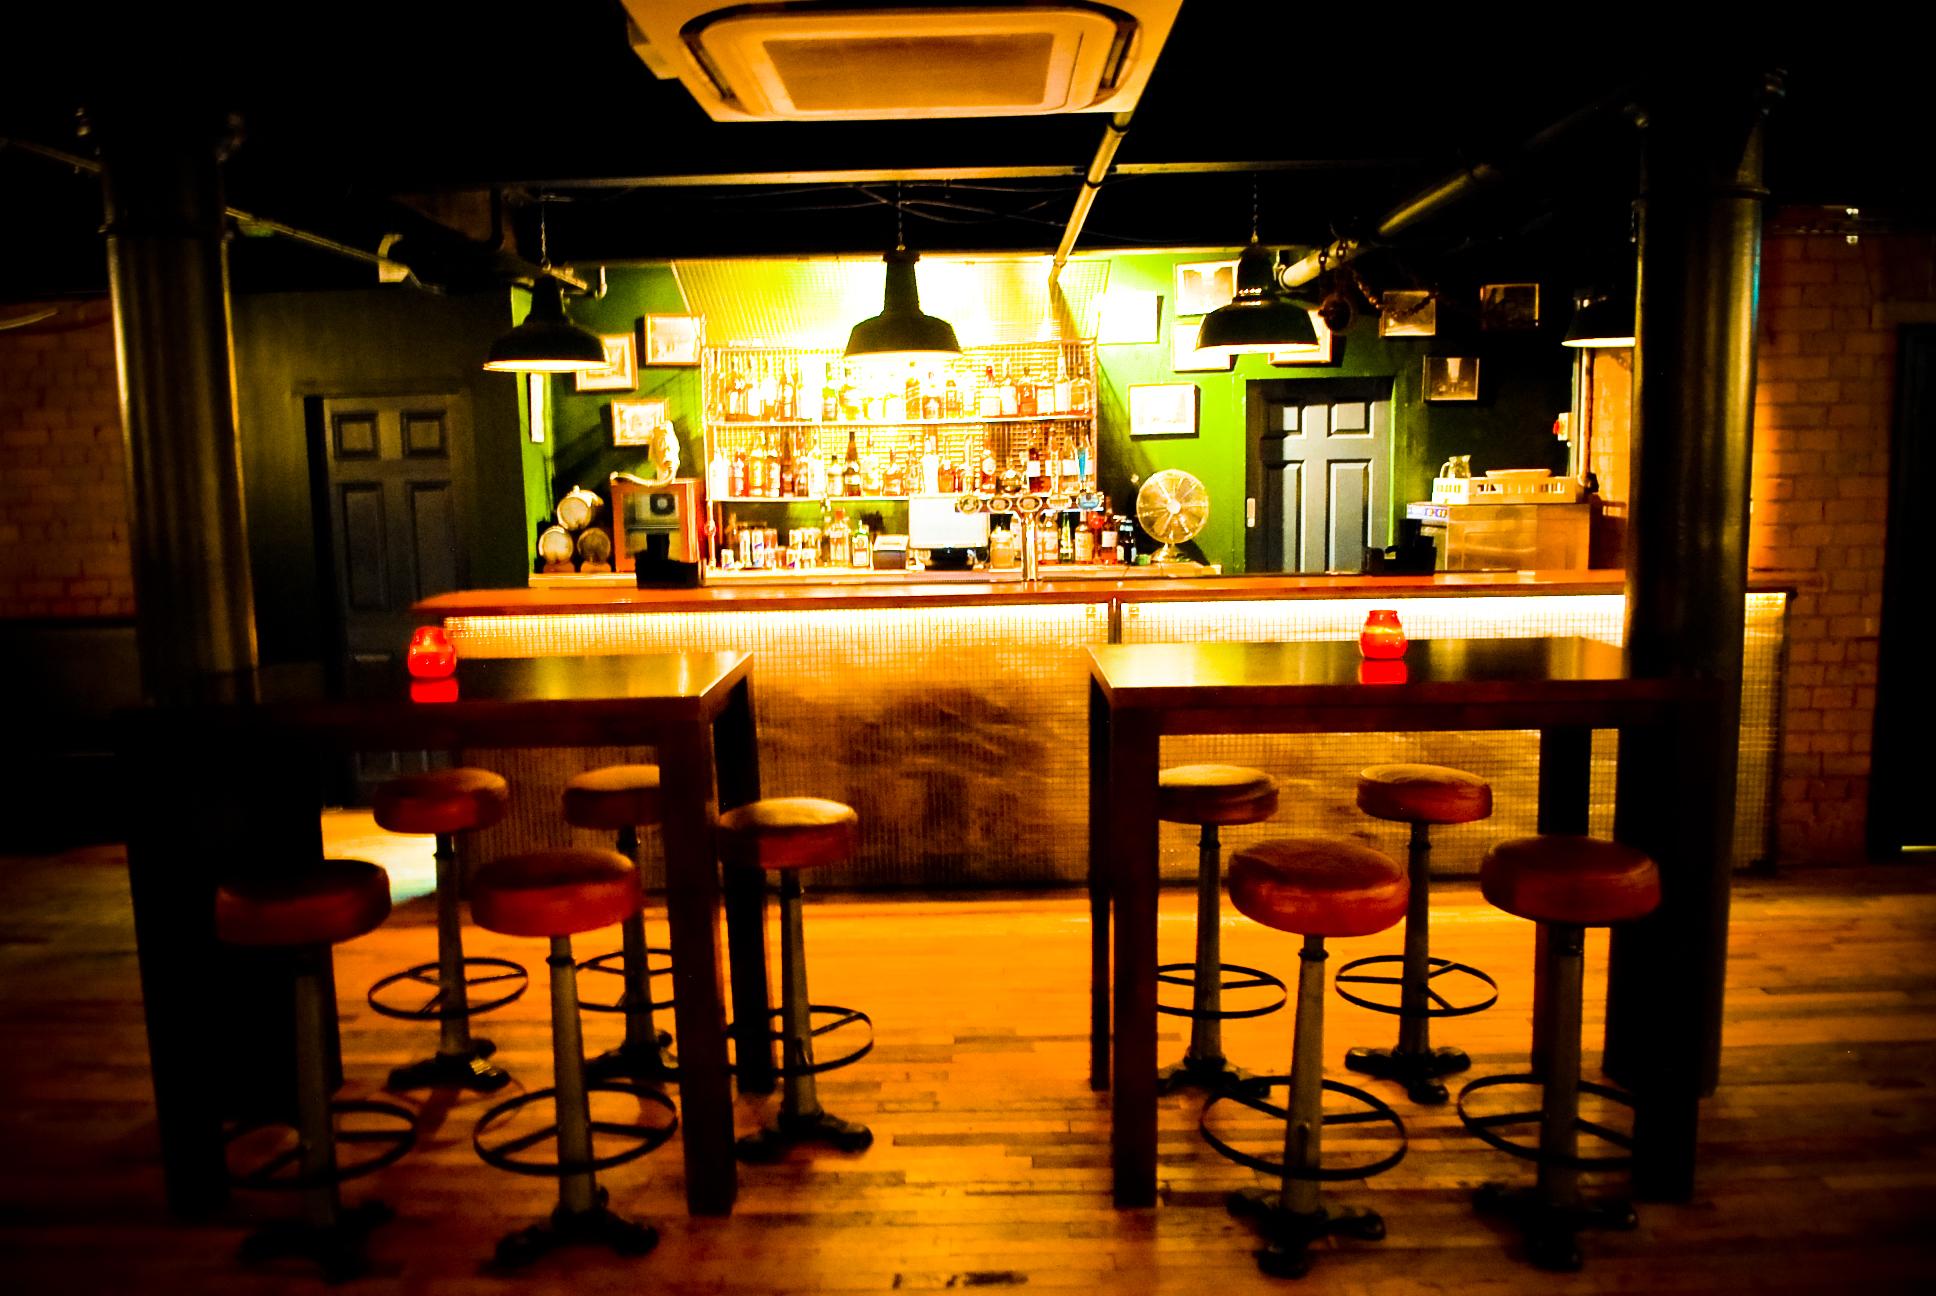 Whiskey-Jar-basement-34-of-42.jpg